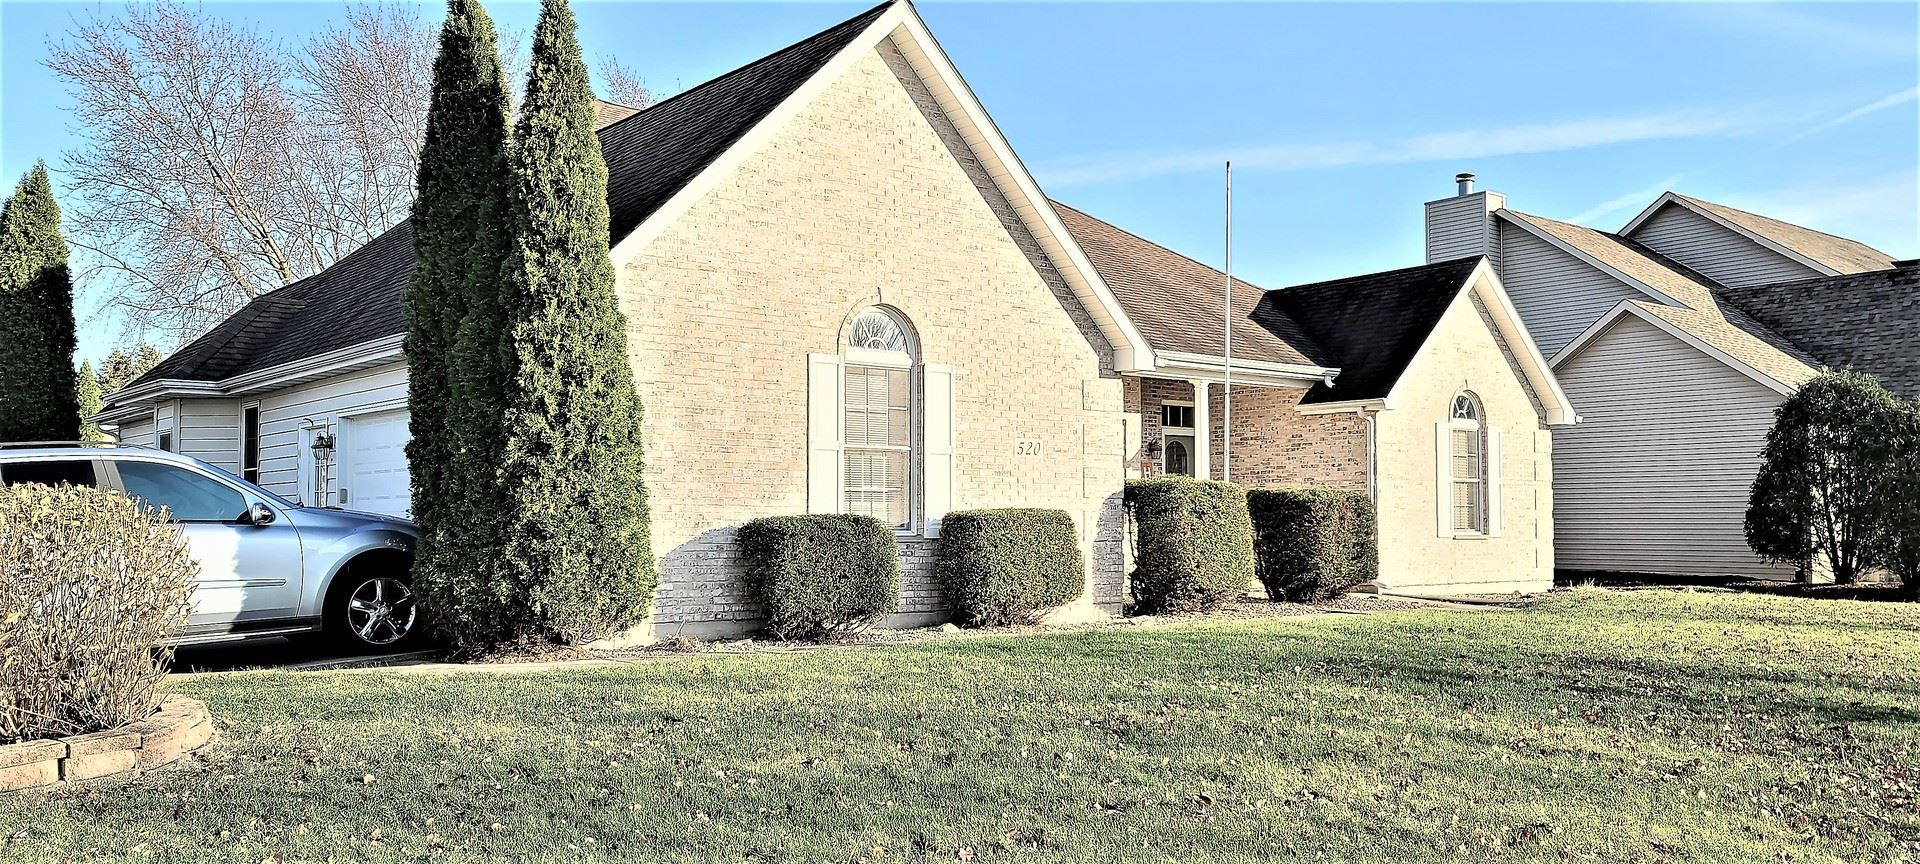 Photo of 520 Bethany Drive, Shorewood, IL 60404 (MLS # 10960343)